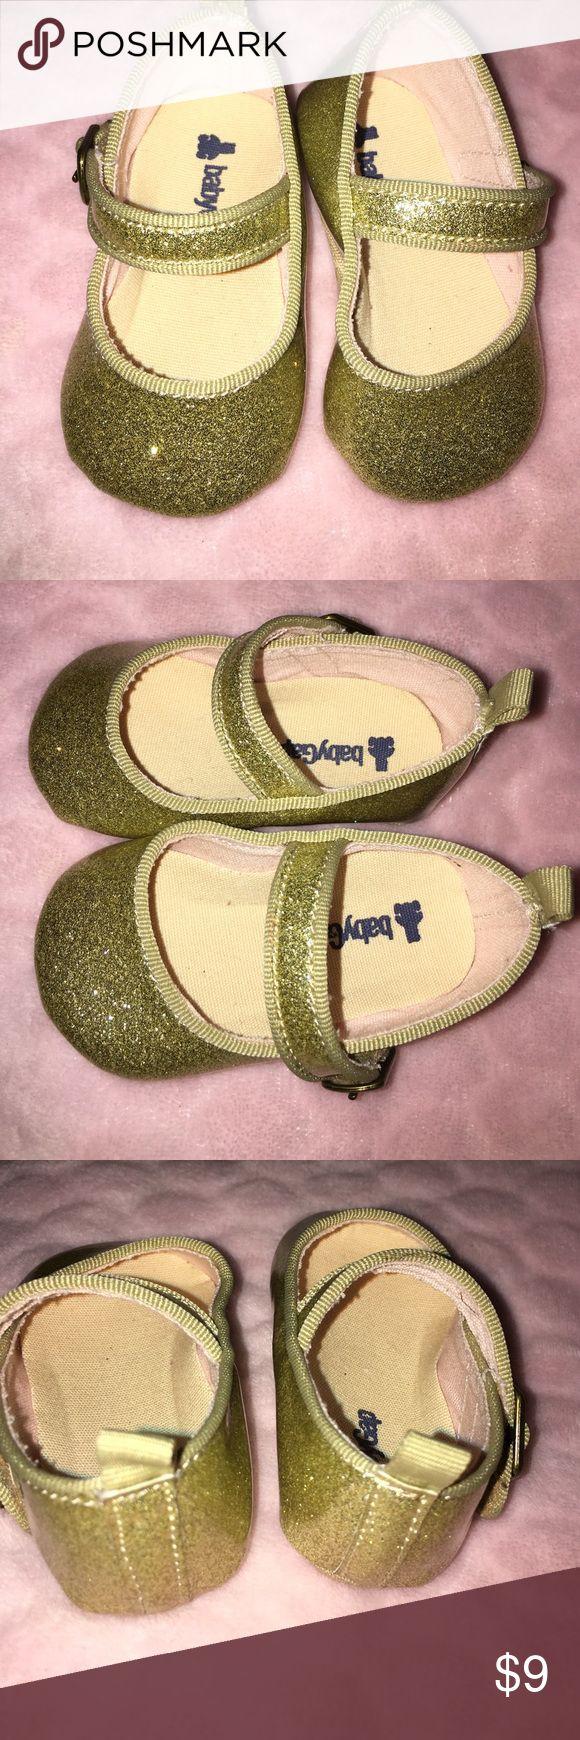 Baby GAP Shoes Girl Size 1 Glitter ✨ Gold Dressy Shoes Girl 3-6 months. Worn once Shoes Dress Shoes